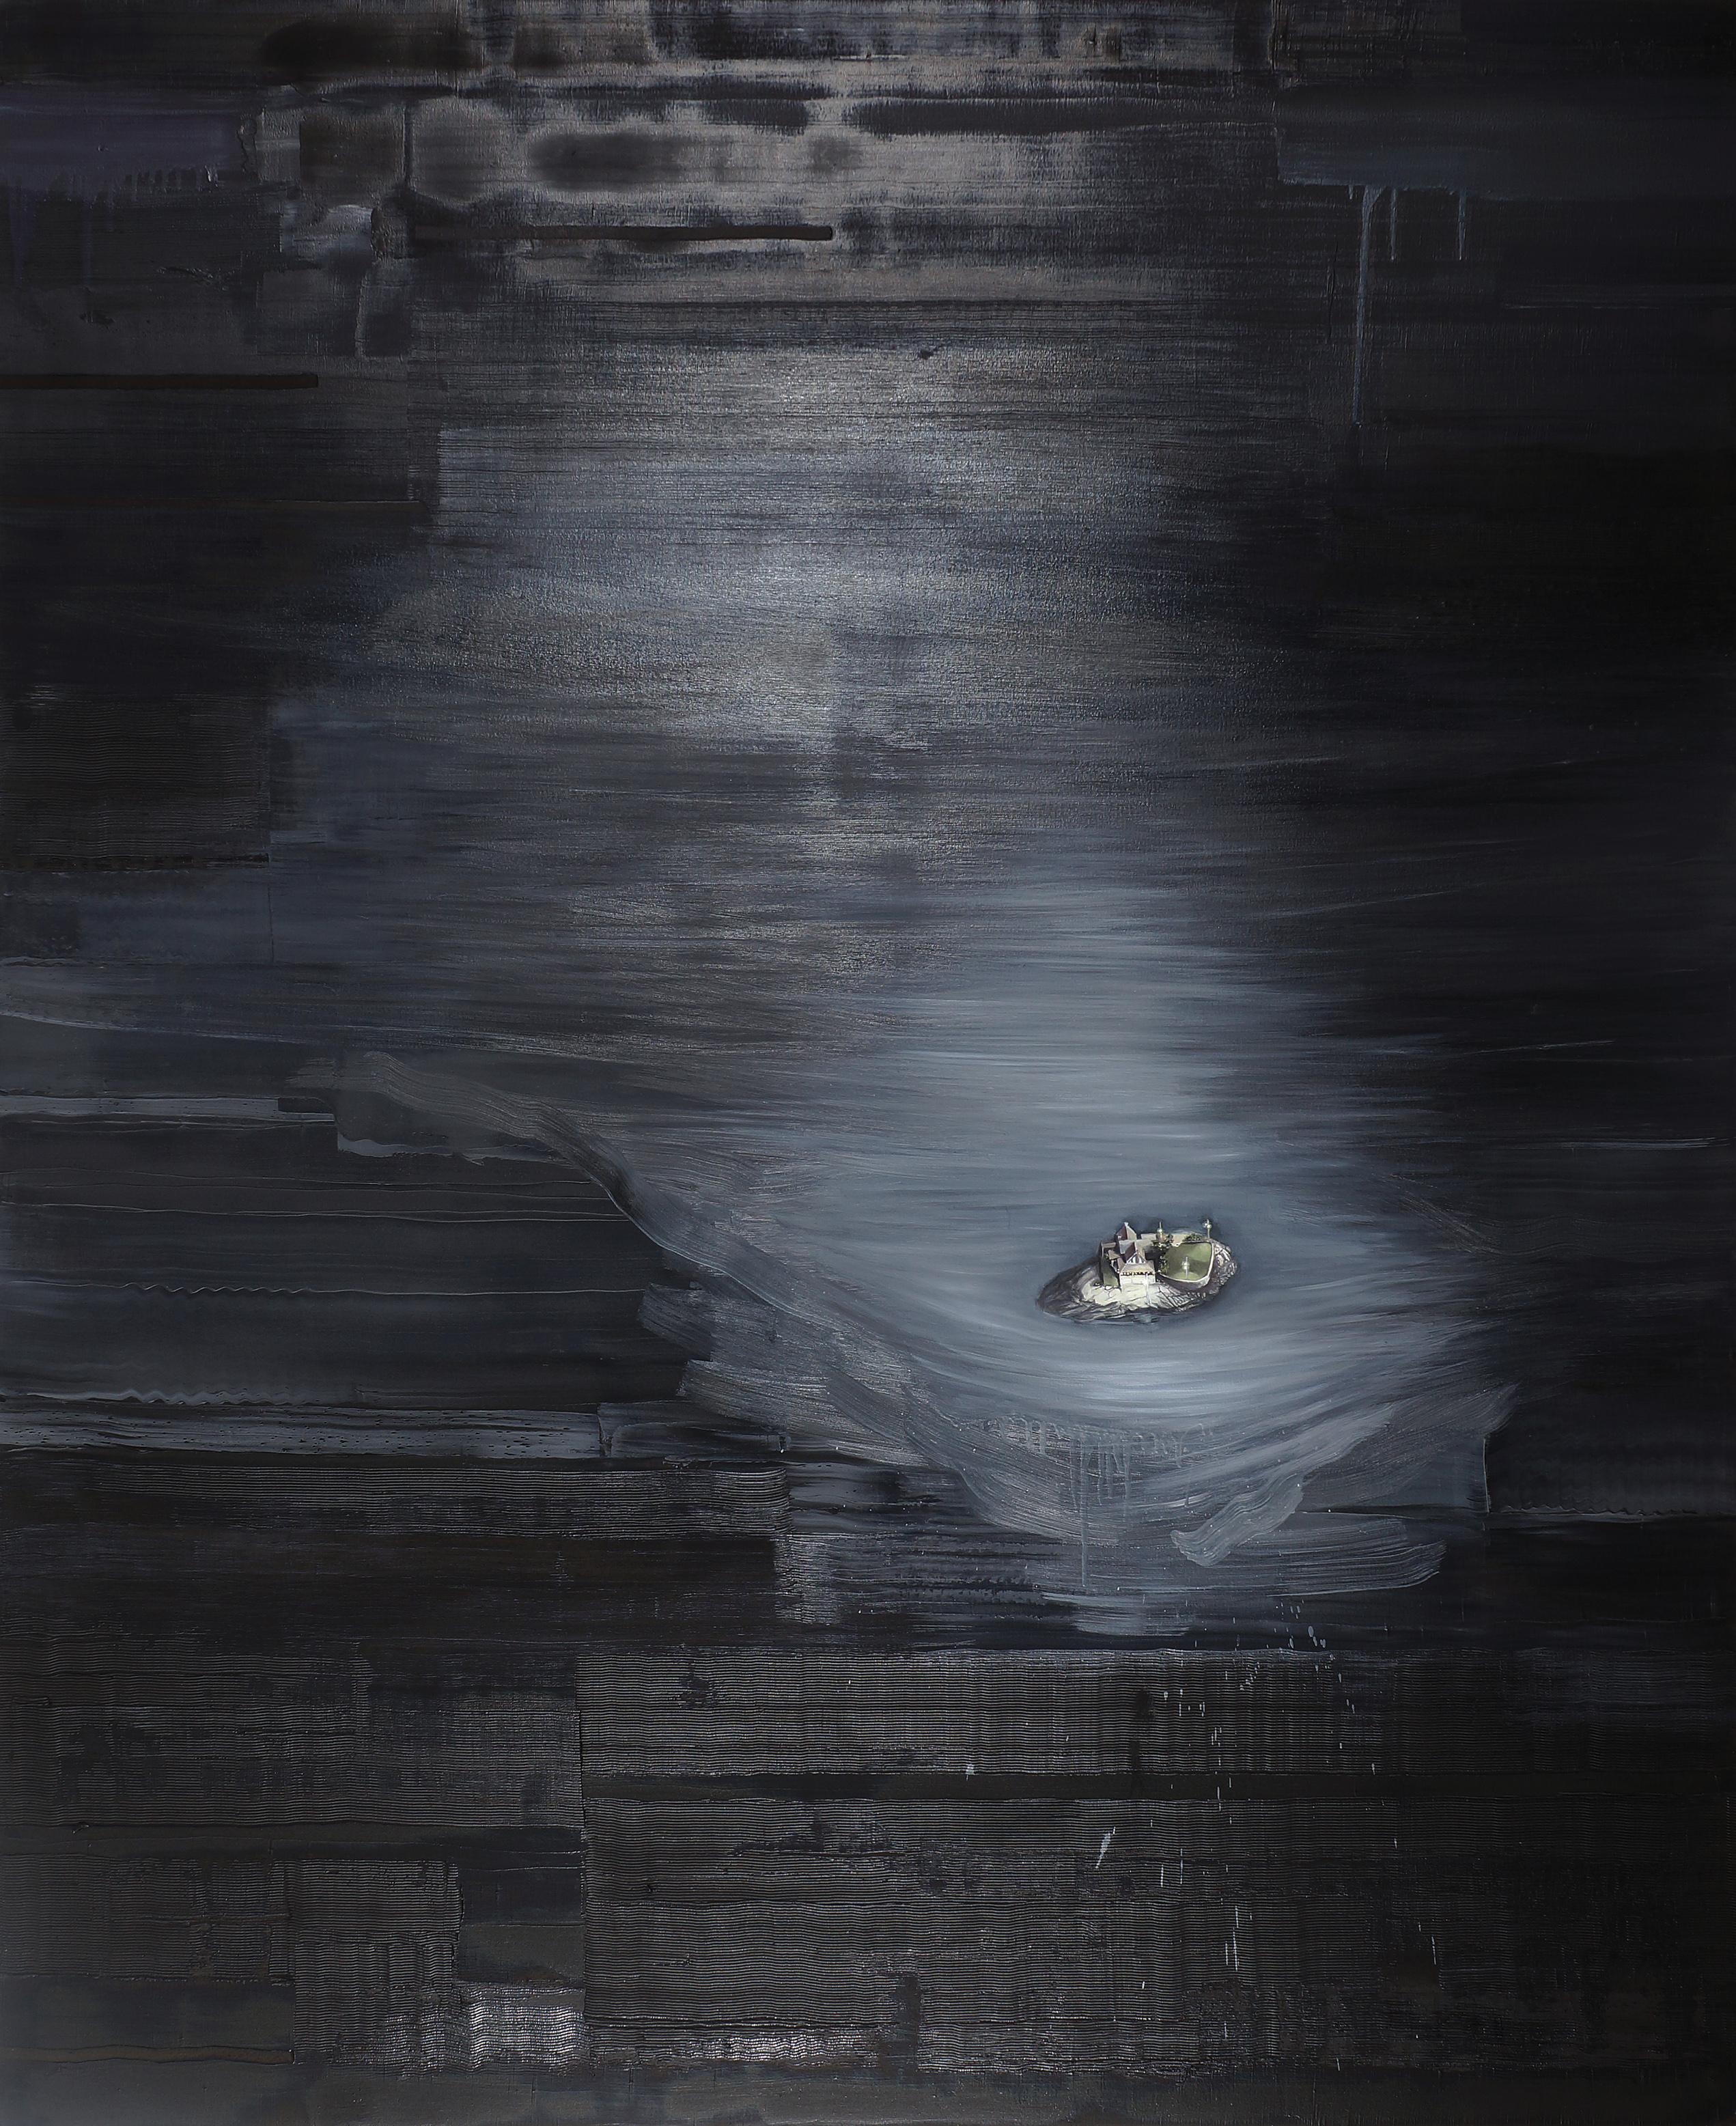 Dark Lands n.2